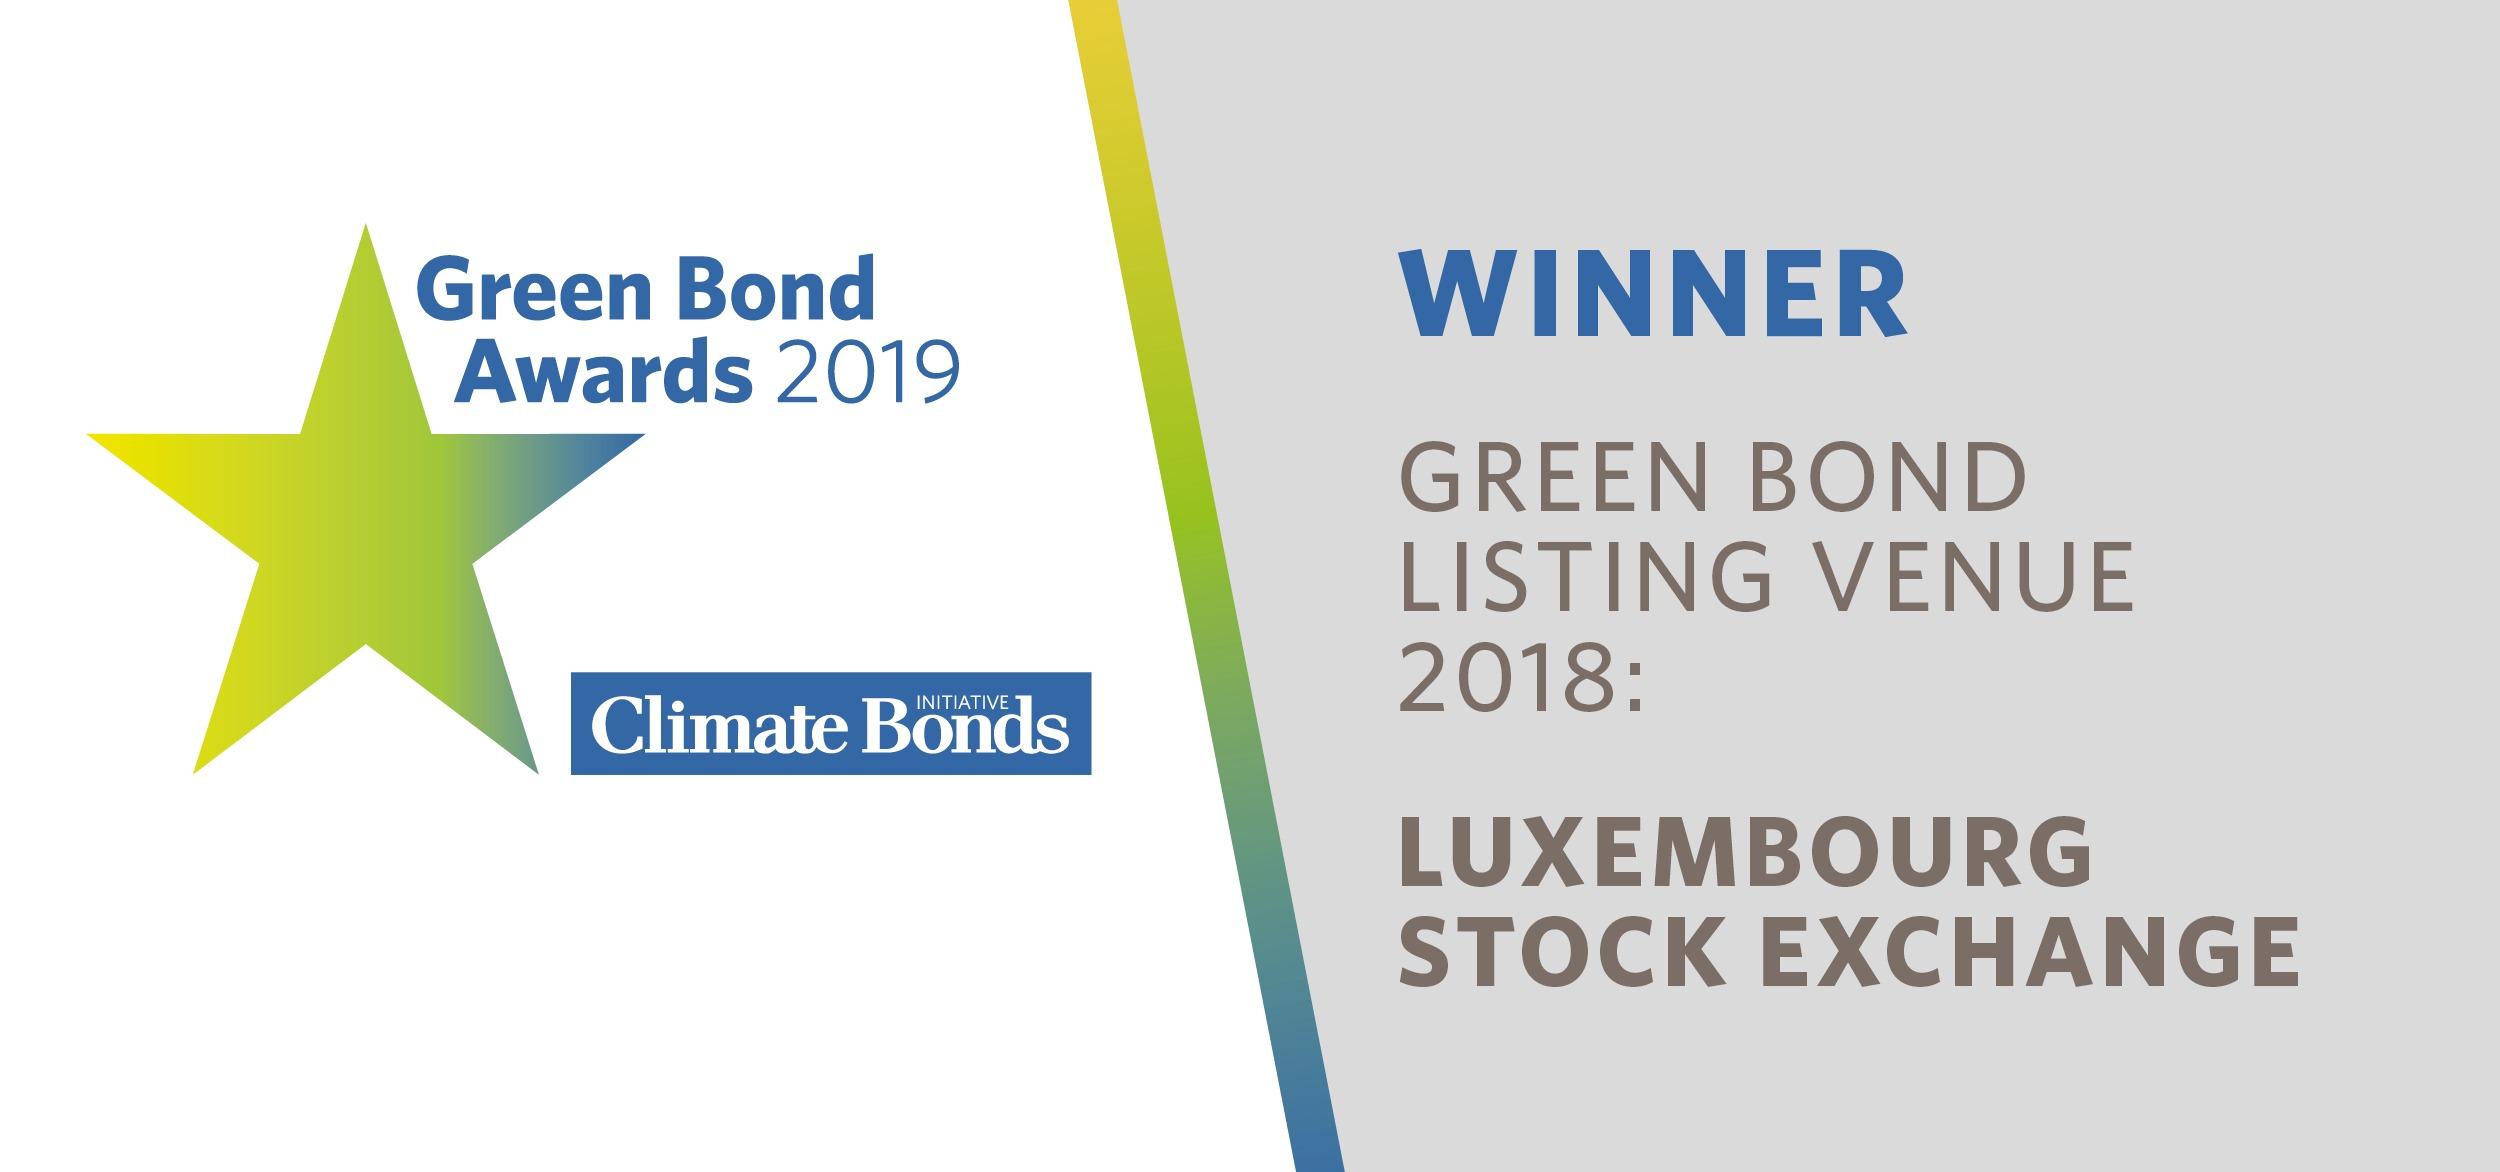 Luxembourg Stock Exchange wins 2019 Green Bond Pioneer Award